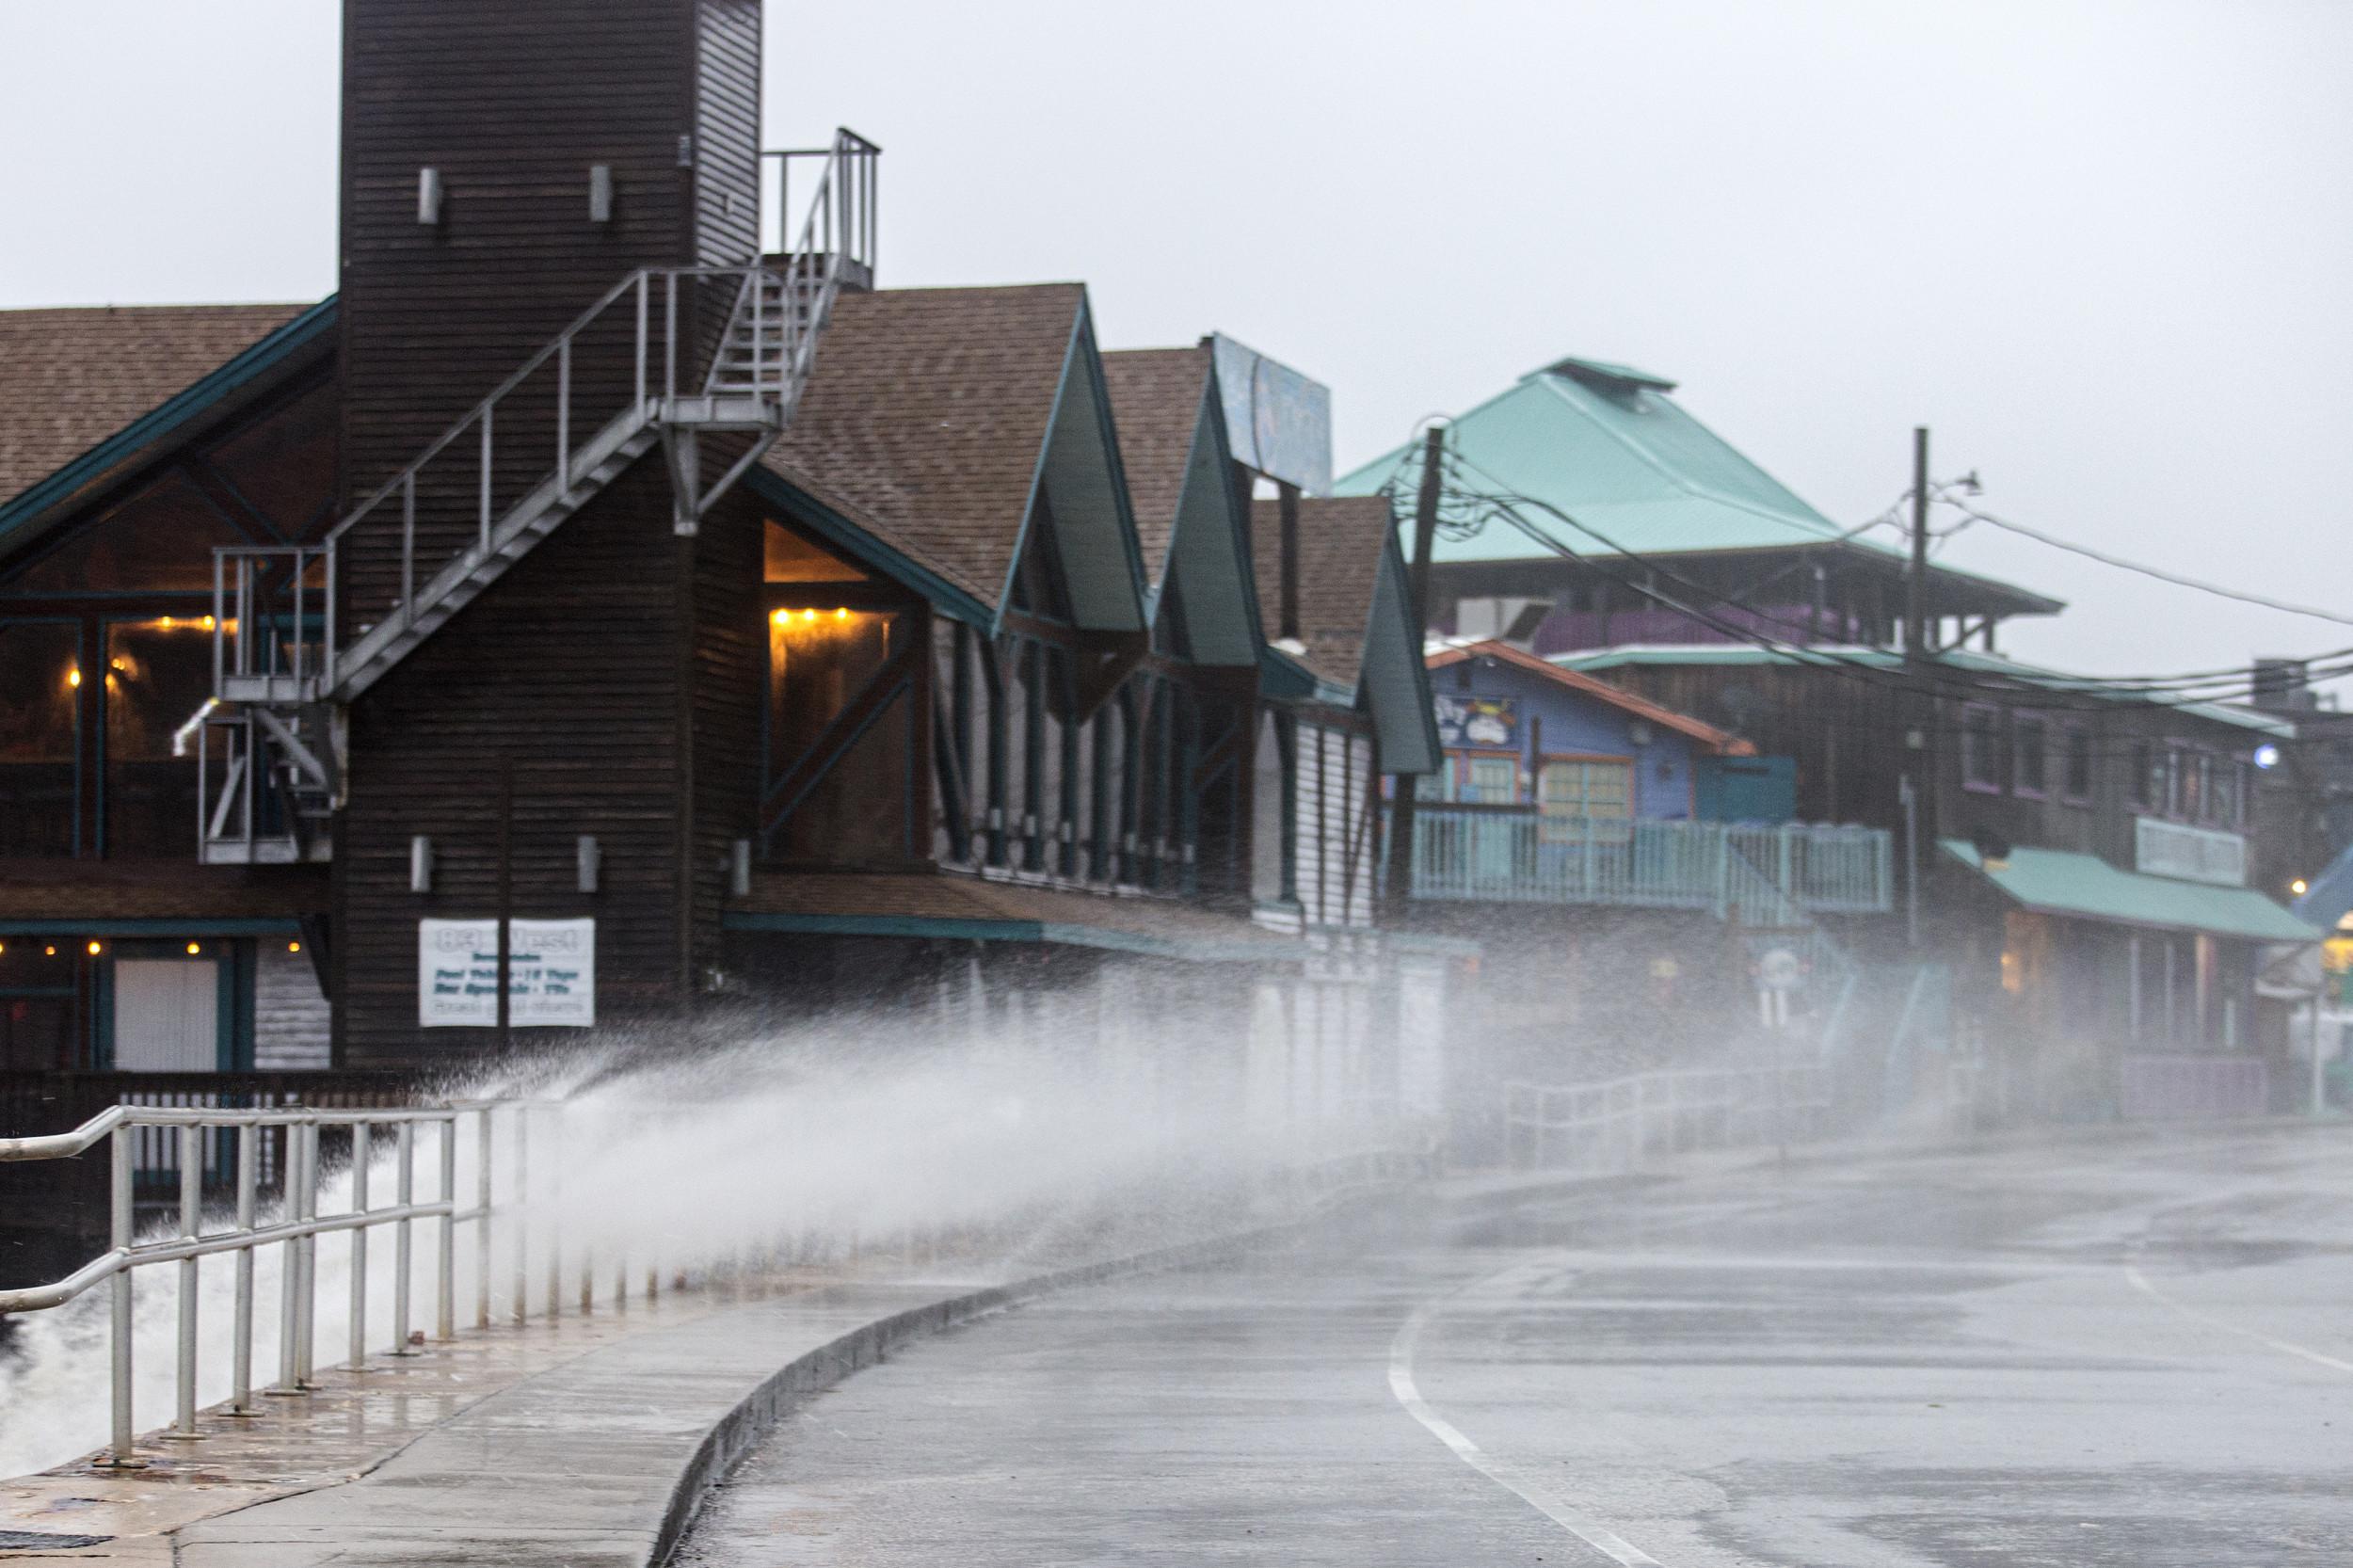 Massachusetts Brace for Tropical Storm Elsa, Largest This Hurricane Season thumbnail